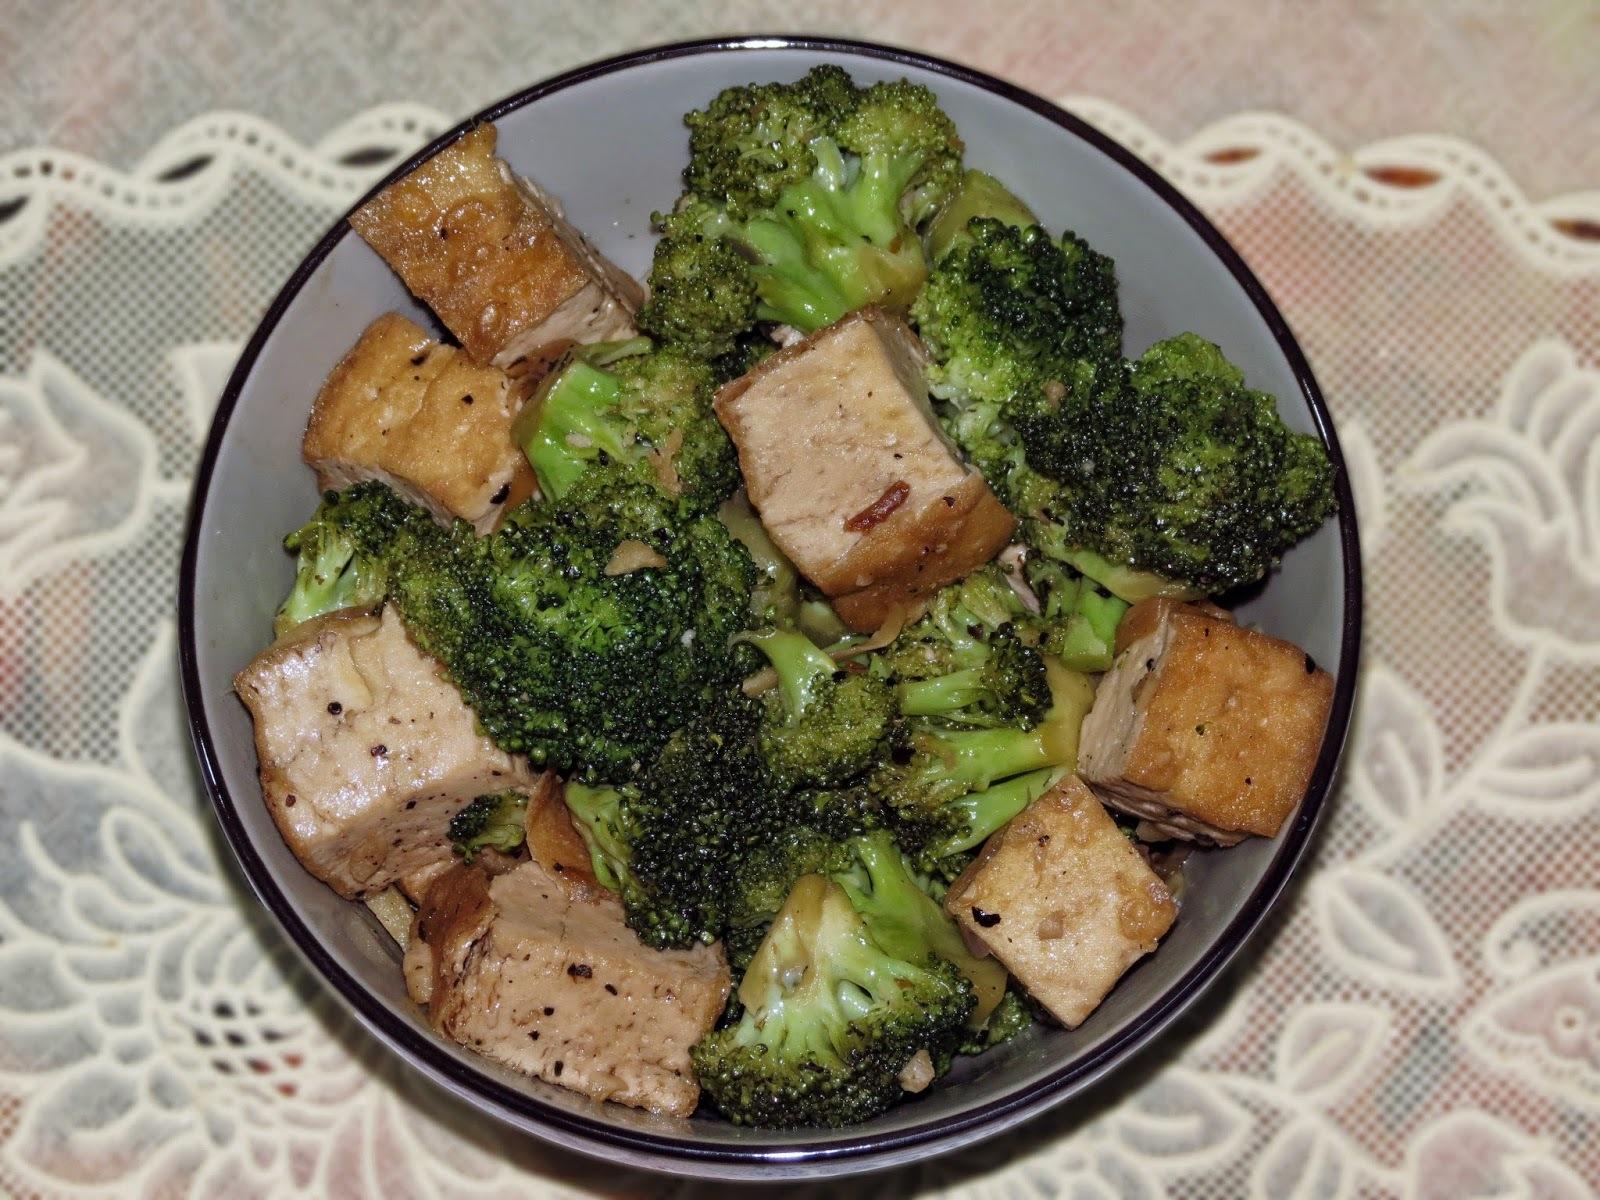 Tofu & Broccoli Stir Fry